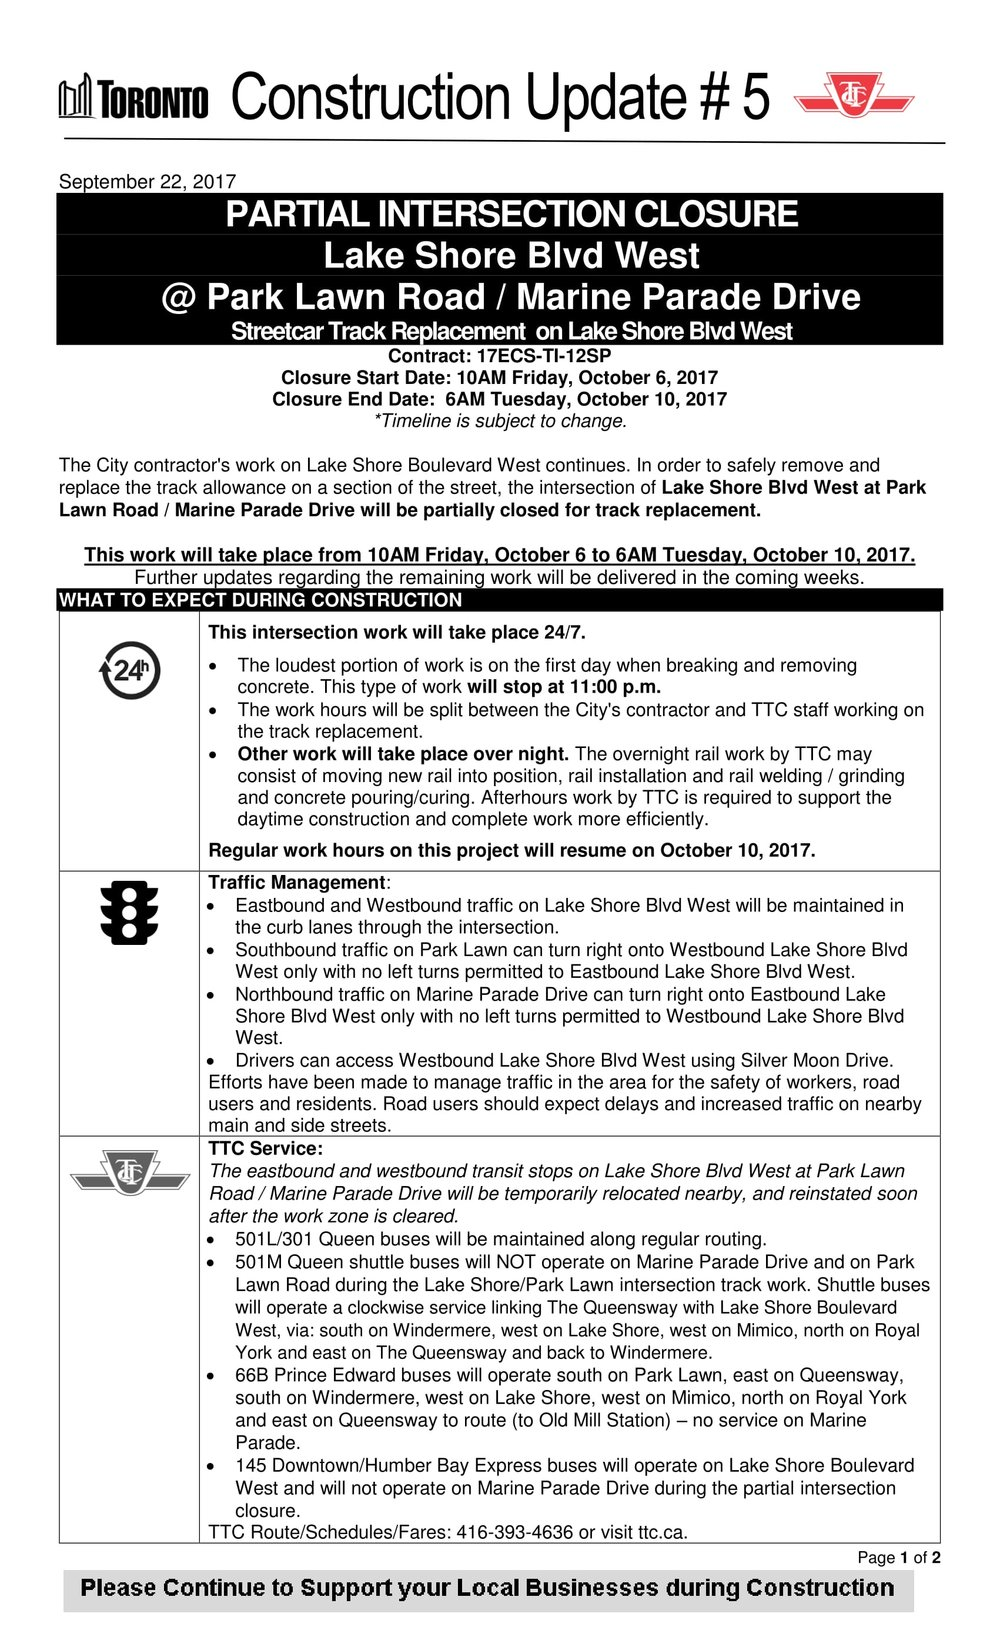 17ECS-TI-12SP_Update 5_Park Lawn and Lake Shore_Ward 6V4 Final-1.jpg